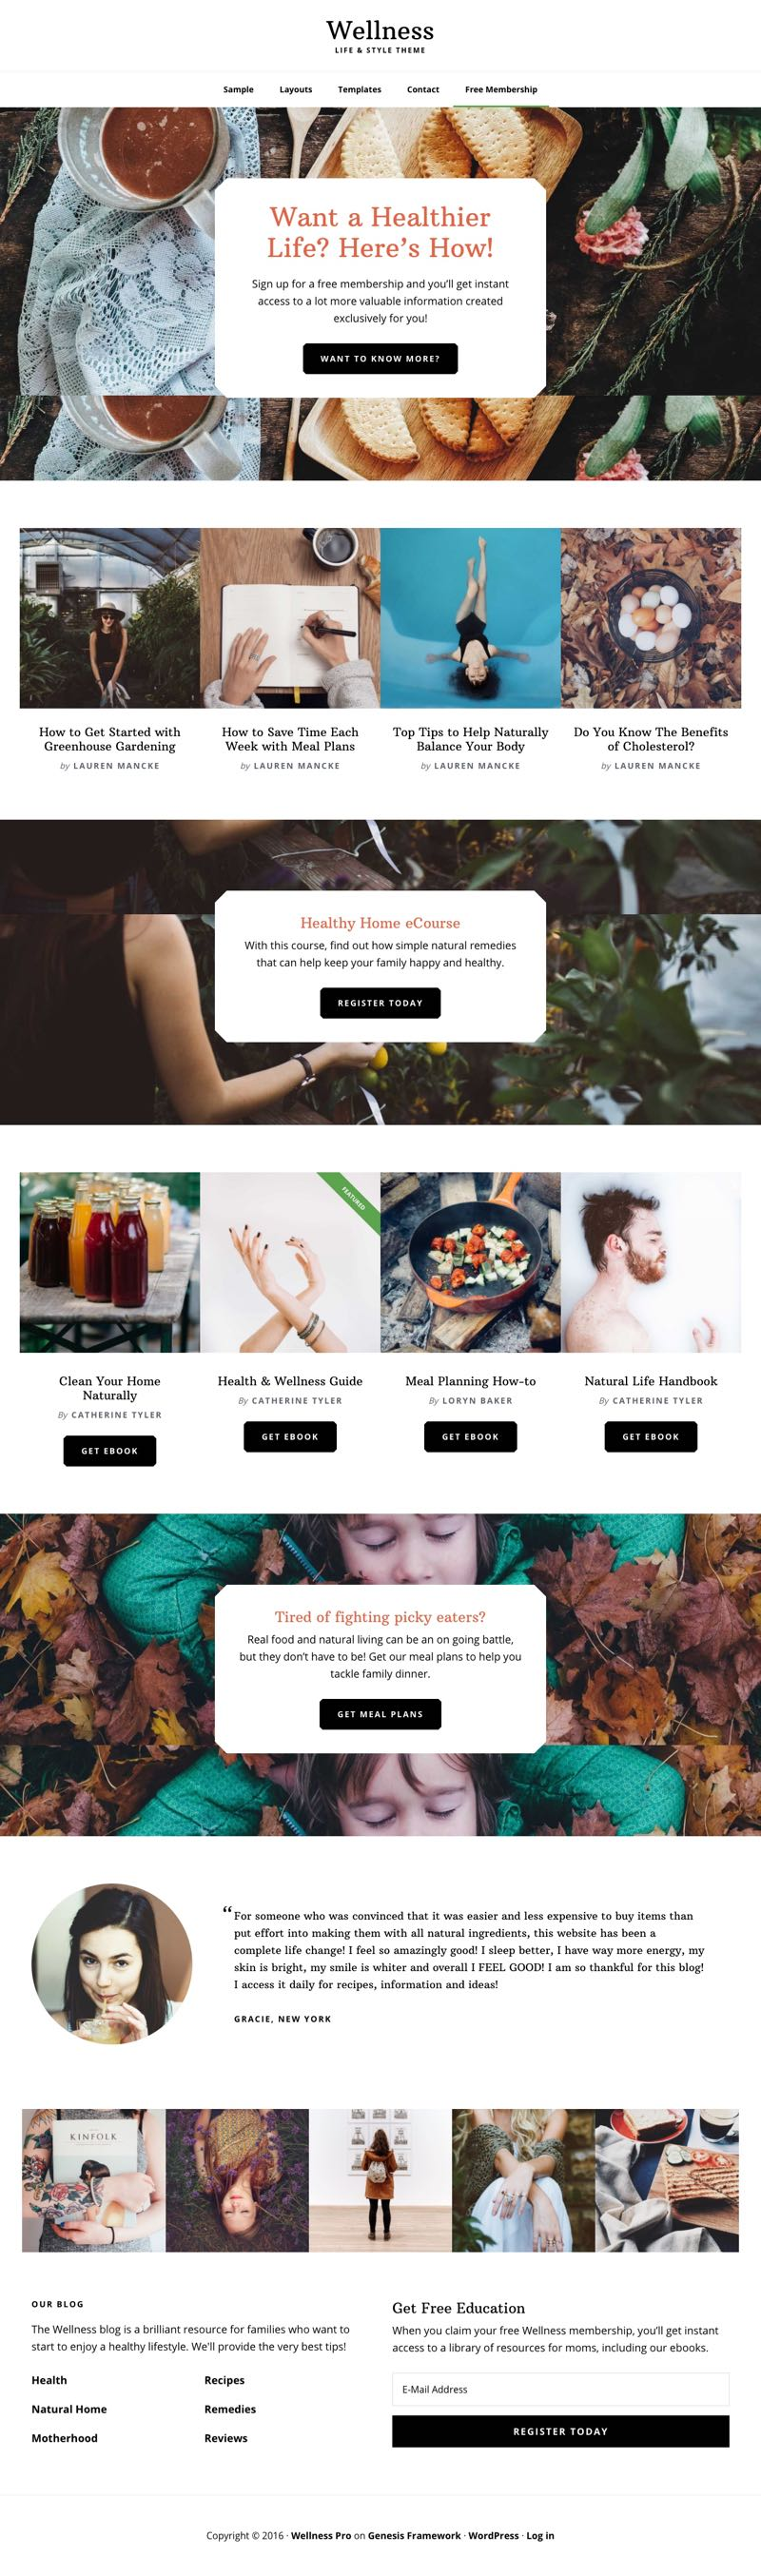 Wellness Pro WordPress Health & Life Style Theme